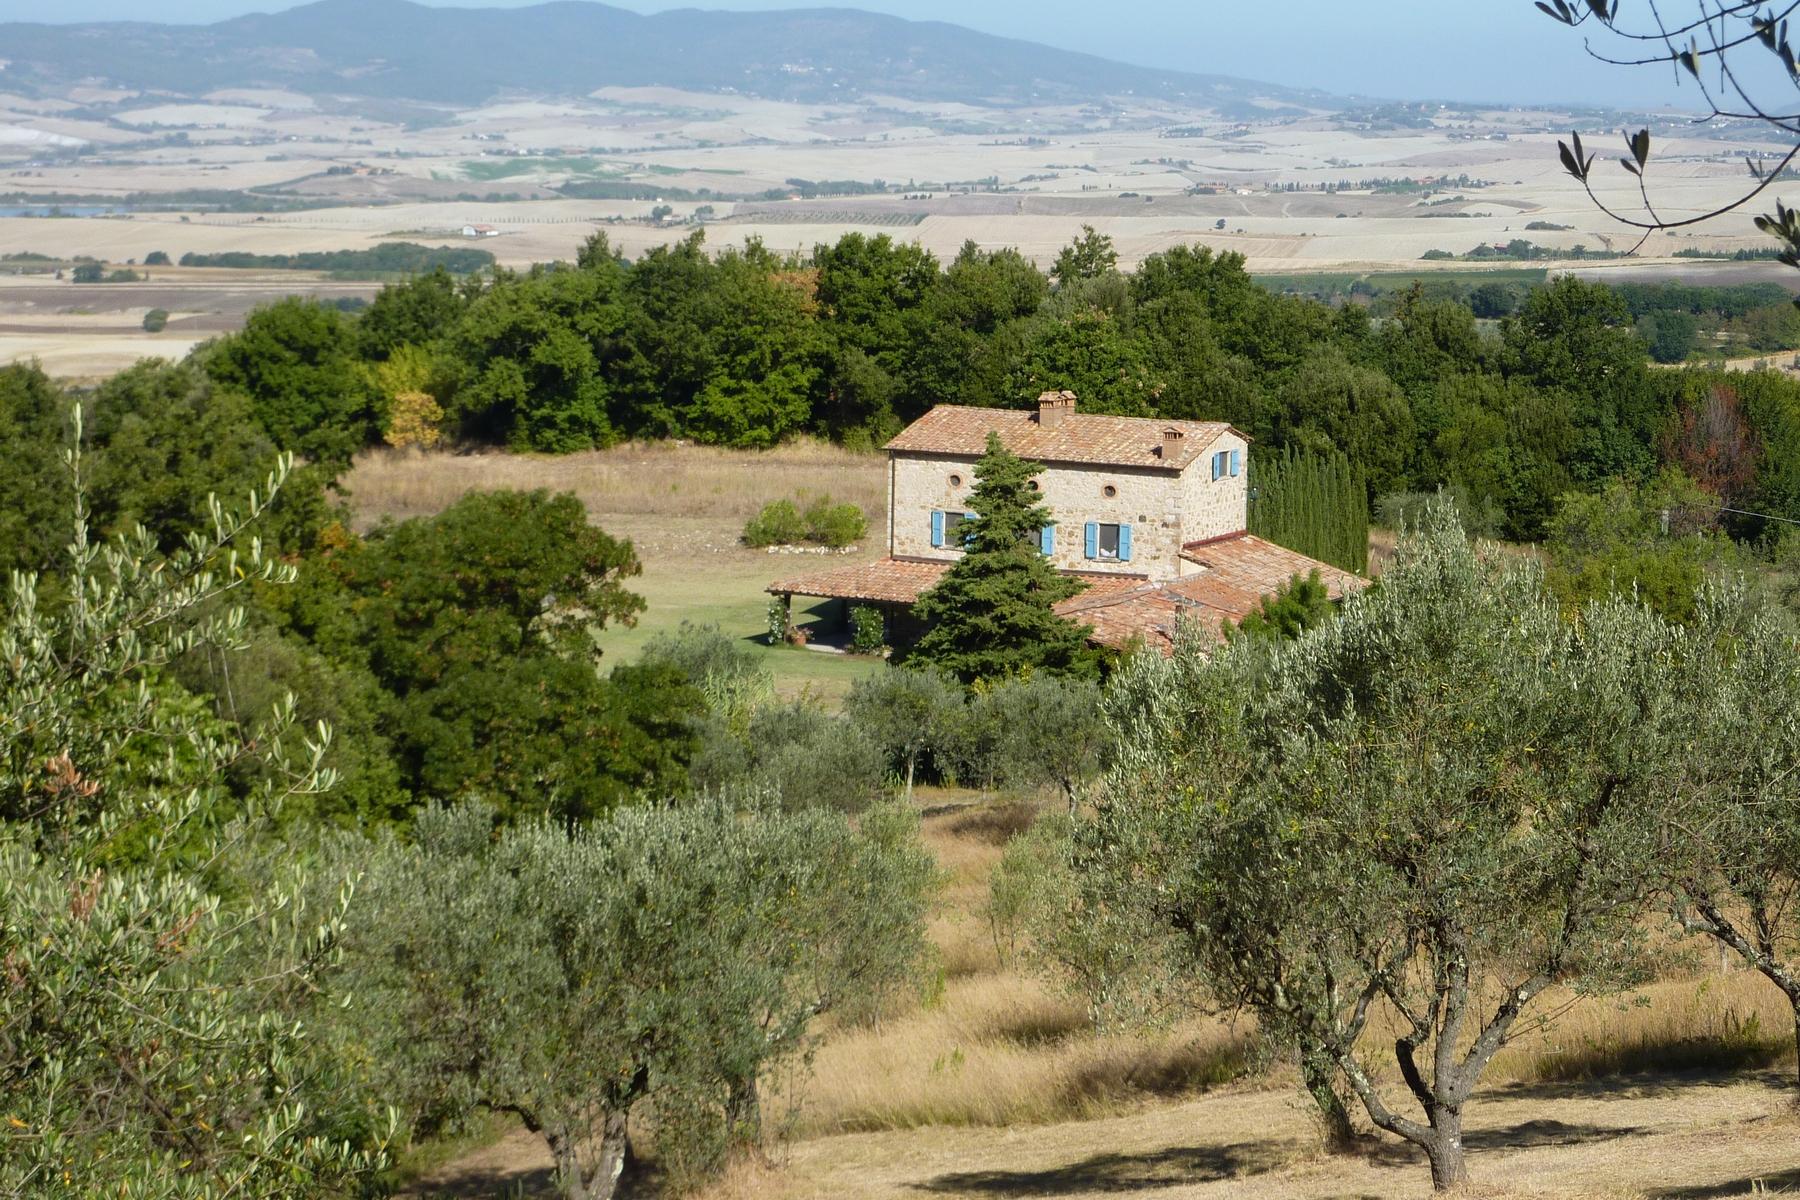 Villa in Vendita a Santa Luce: 5 locali, 270 mq - Foto 19